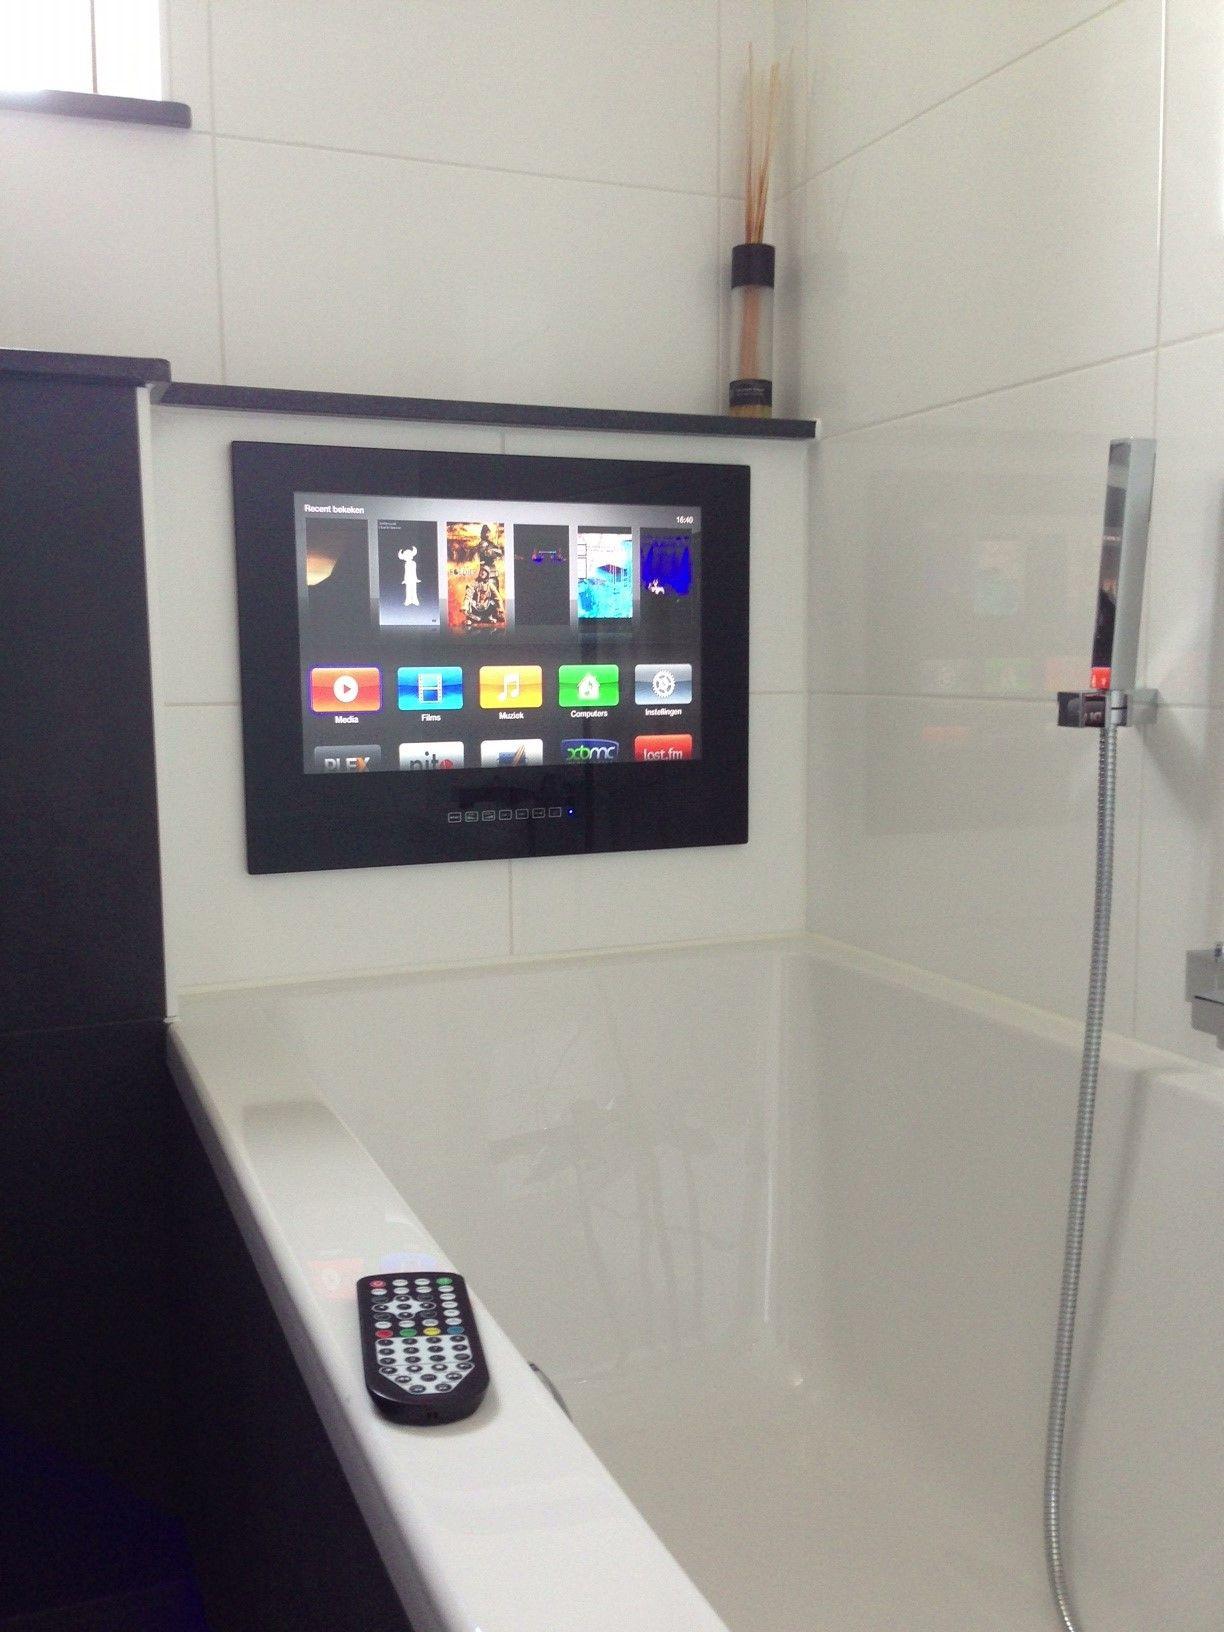 badkamer televisie 17 inch met dvb c tuner. Black Bedroom Furniture Sets. Home Design Ideas